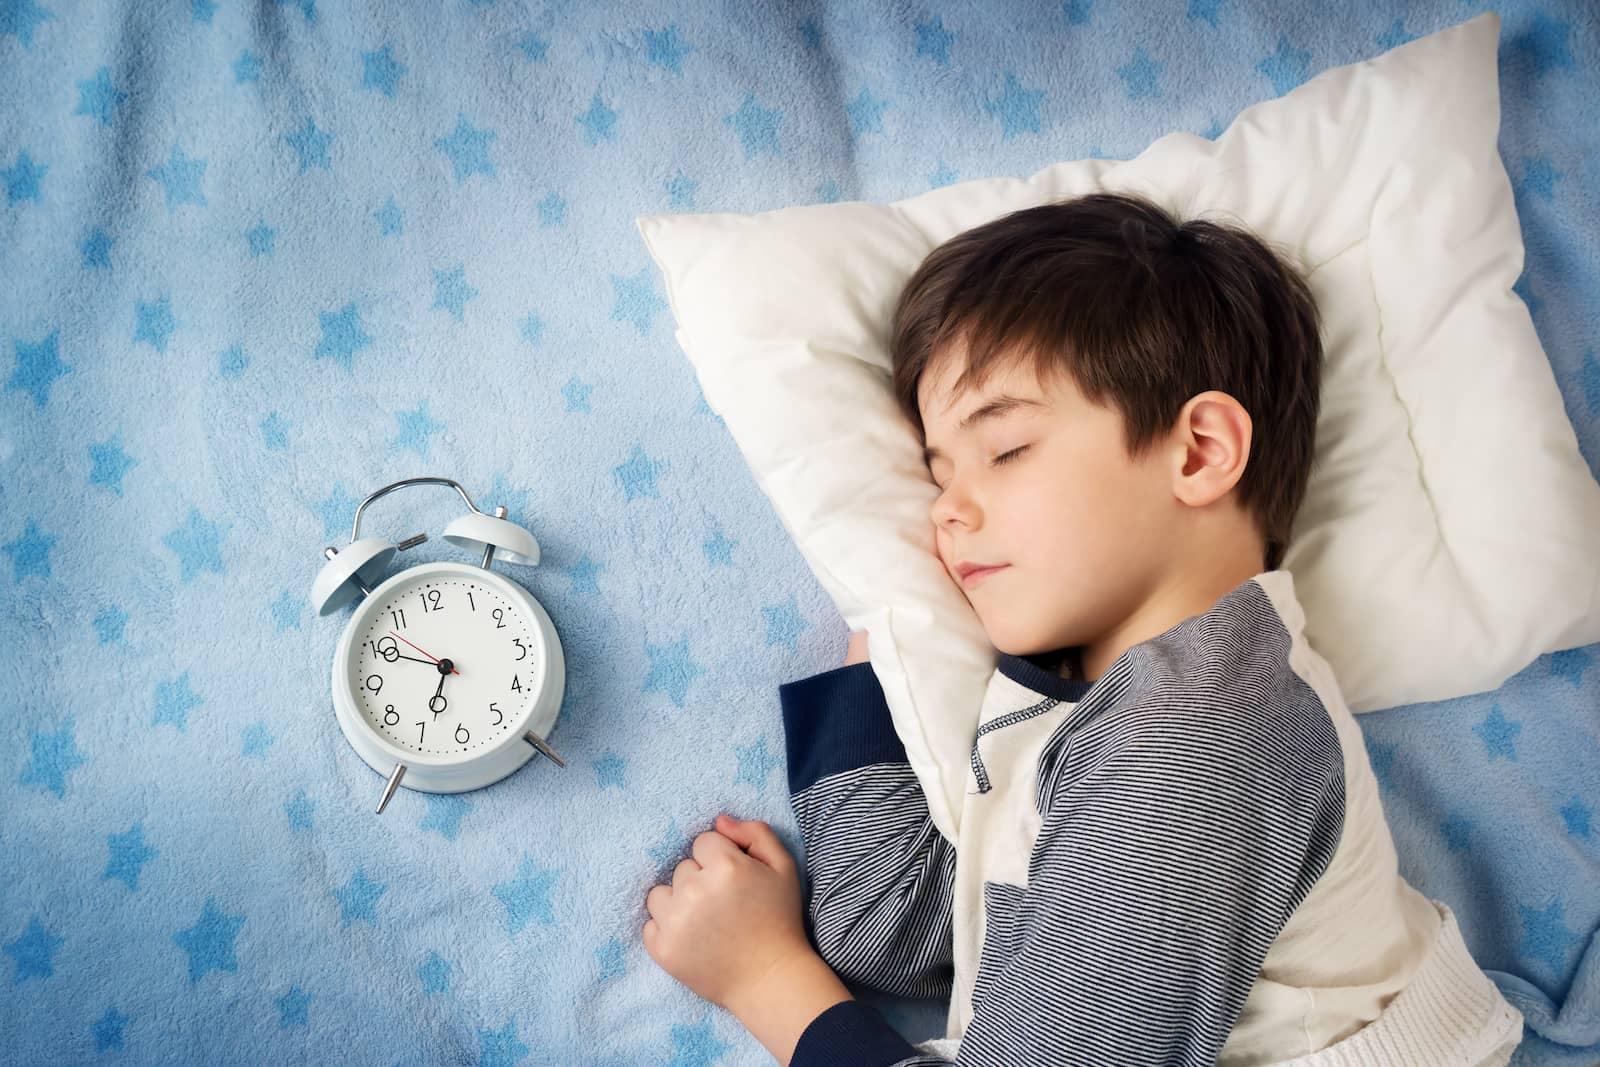 7 rituais de horas de dormir que funcionam 1